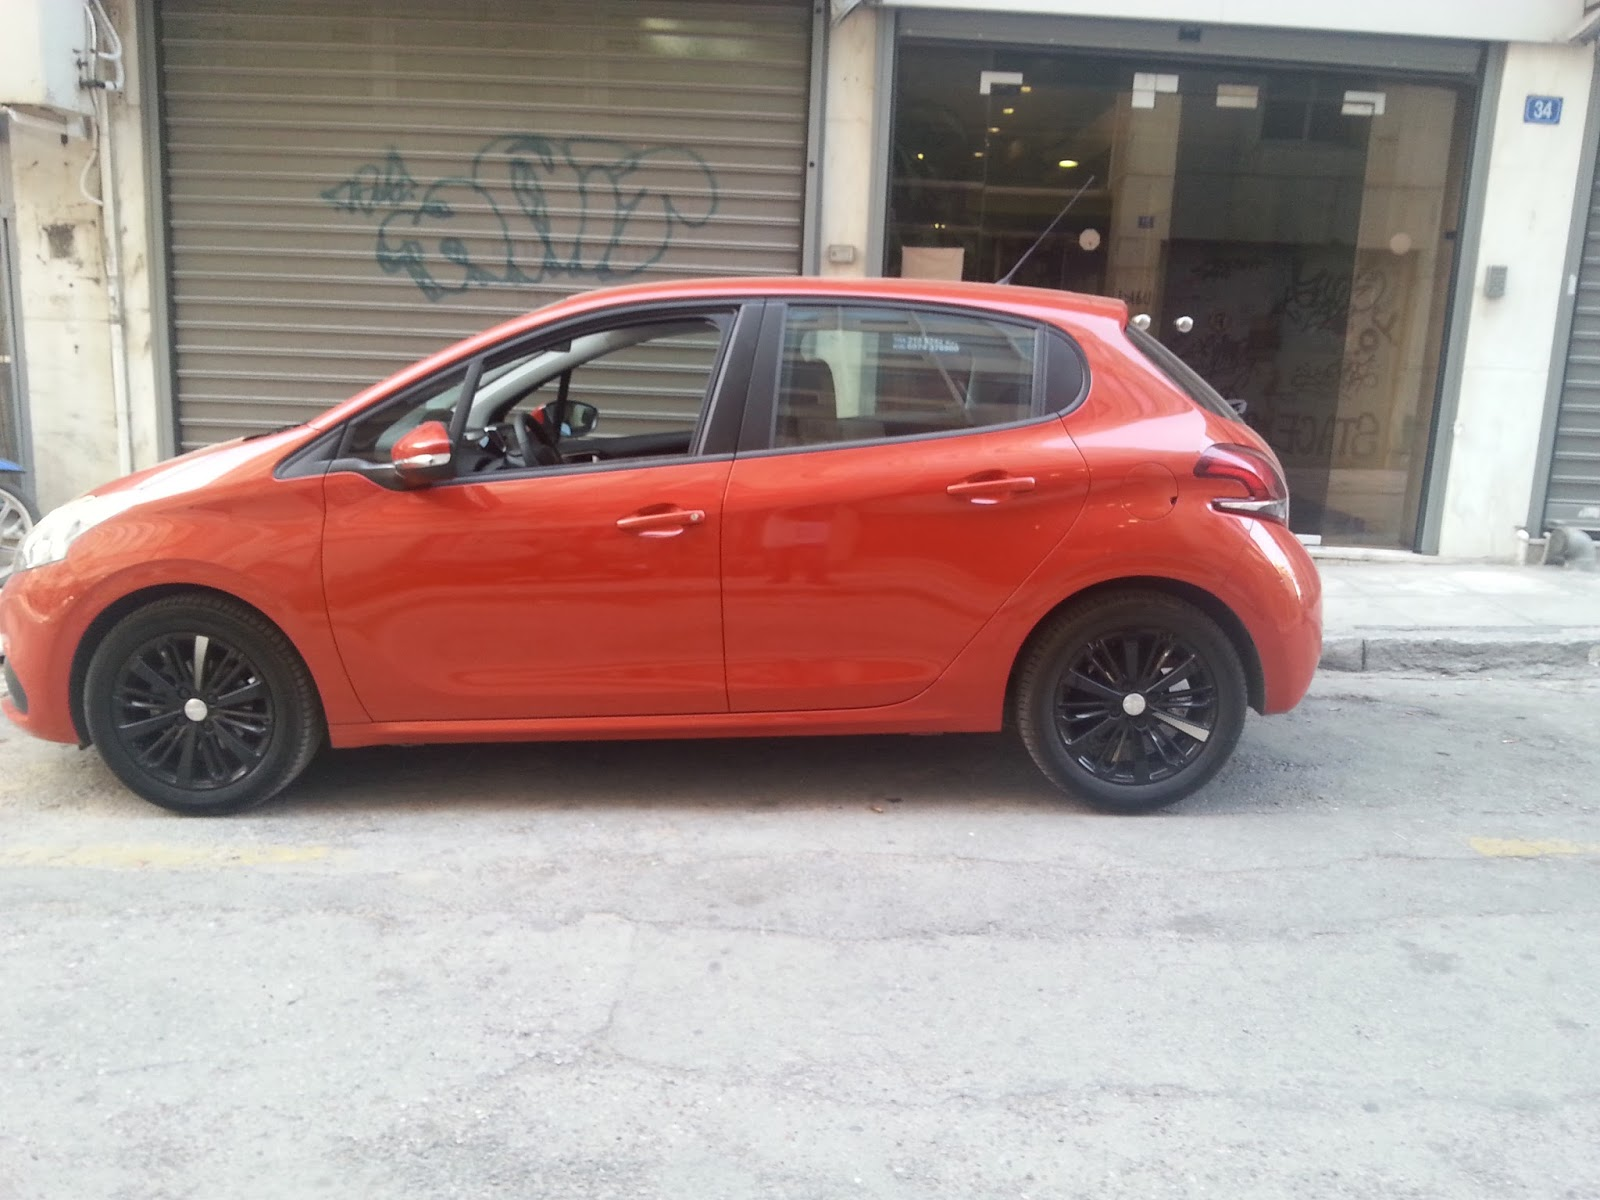 f3 2 Ρίχνουμε στην κίνηση της Αθήνας το Peugeot 208 1,2 Peugeot, Peugeot 208, TEST, zblog, ΔΟΚΙΜΕΣ, οδηγούμε